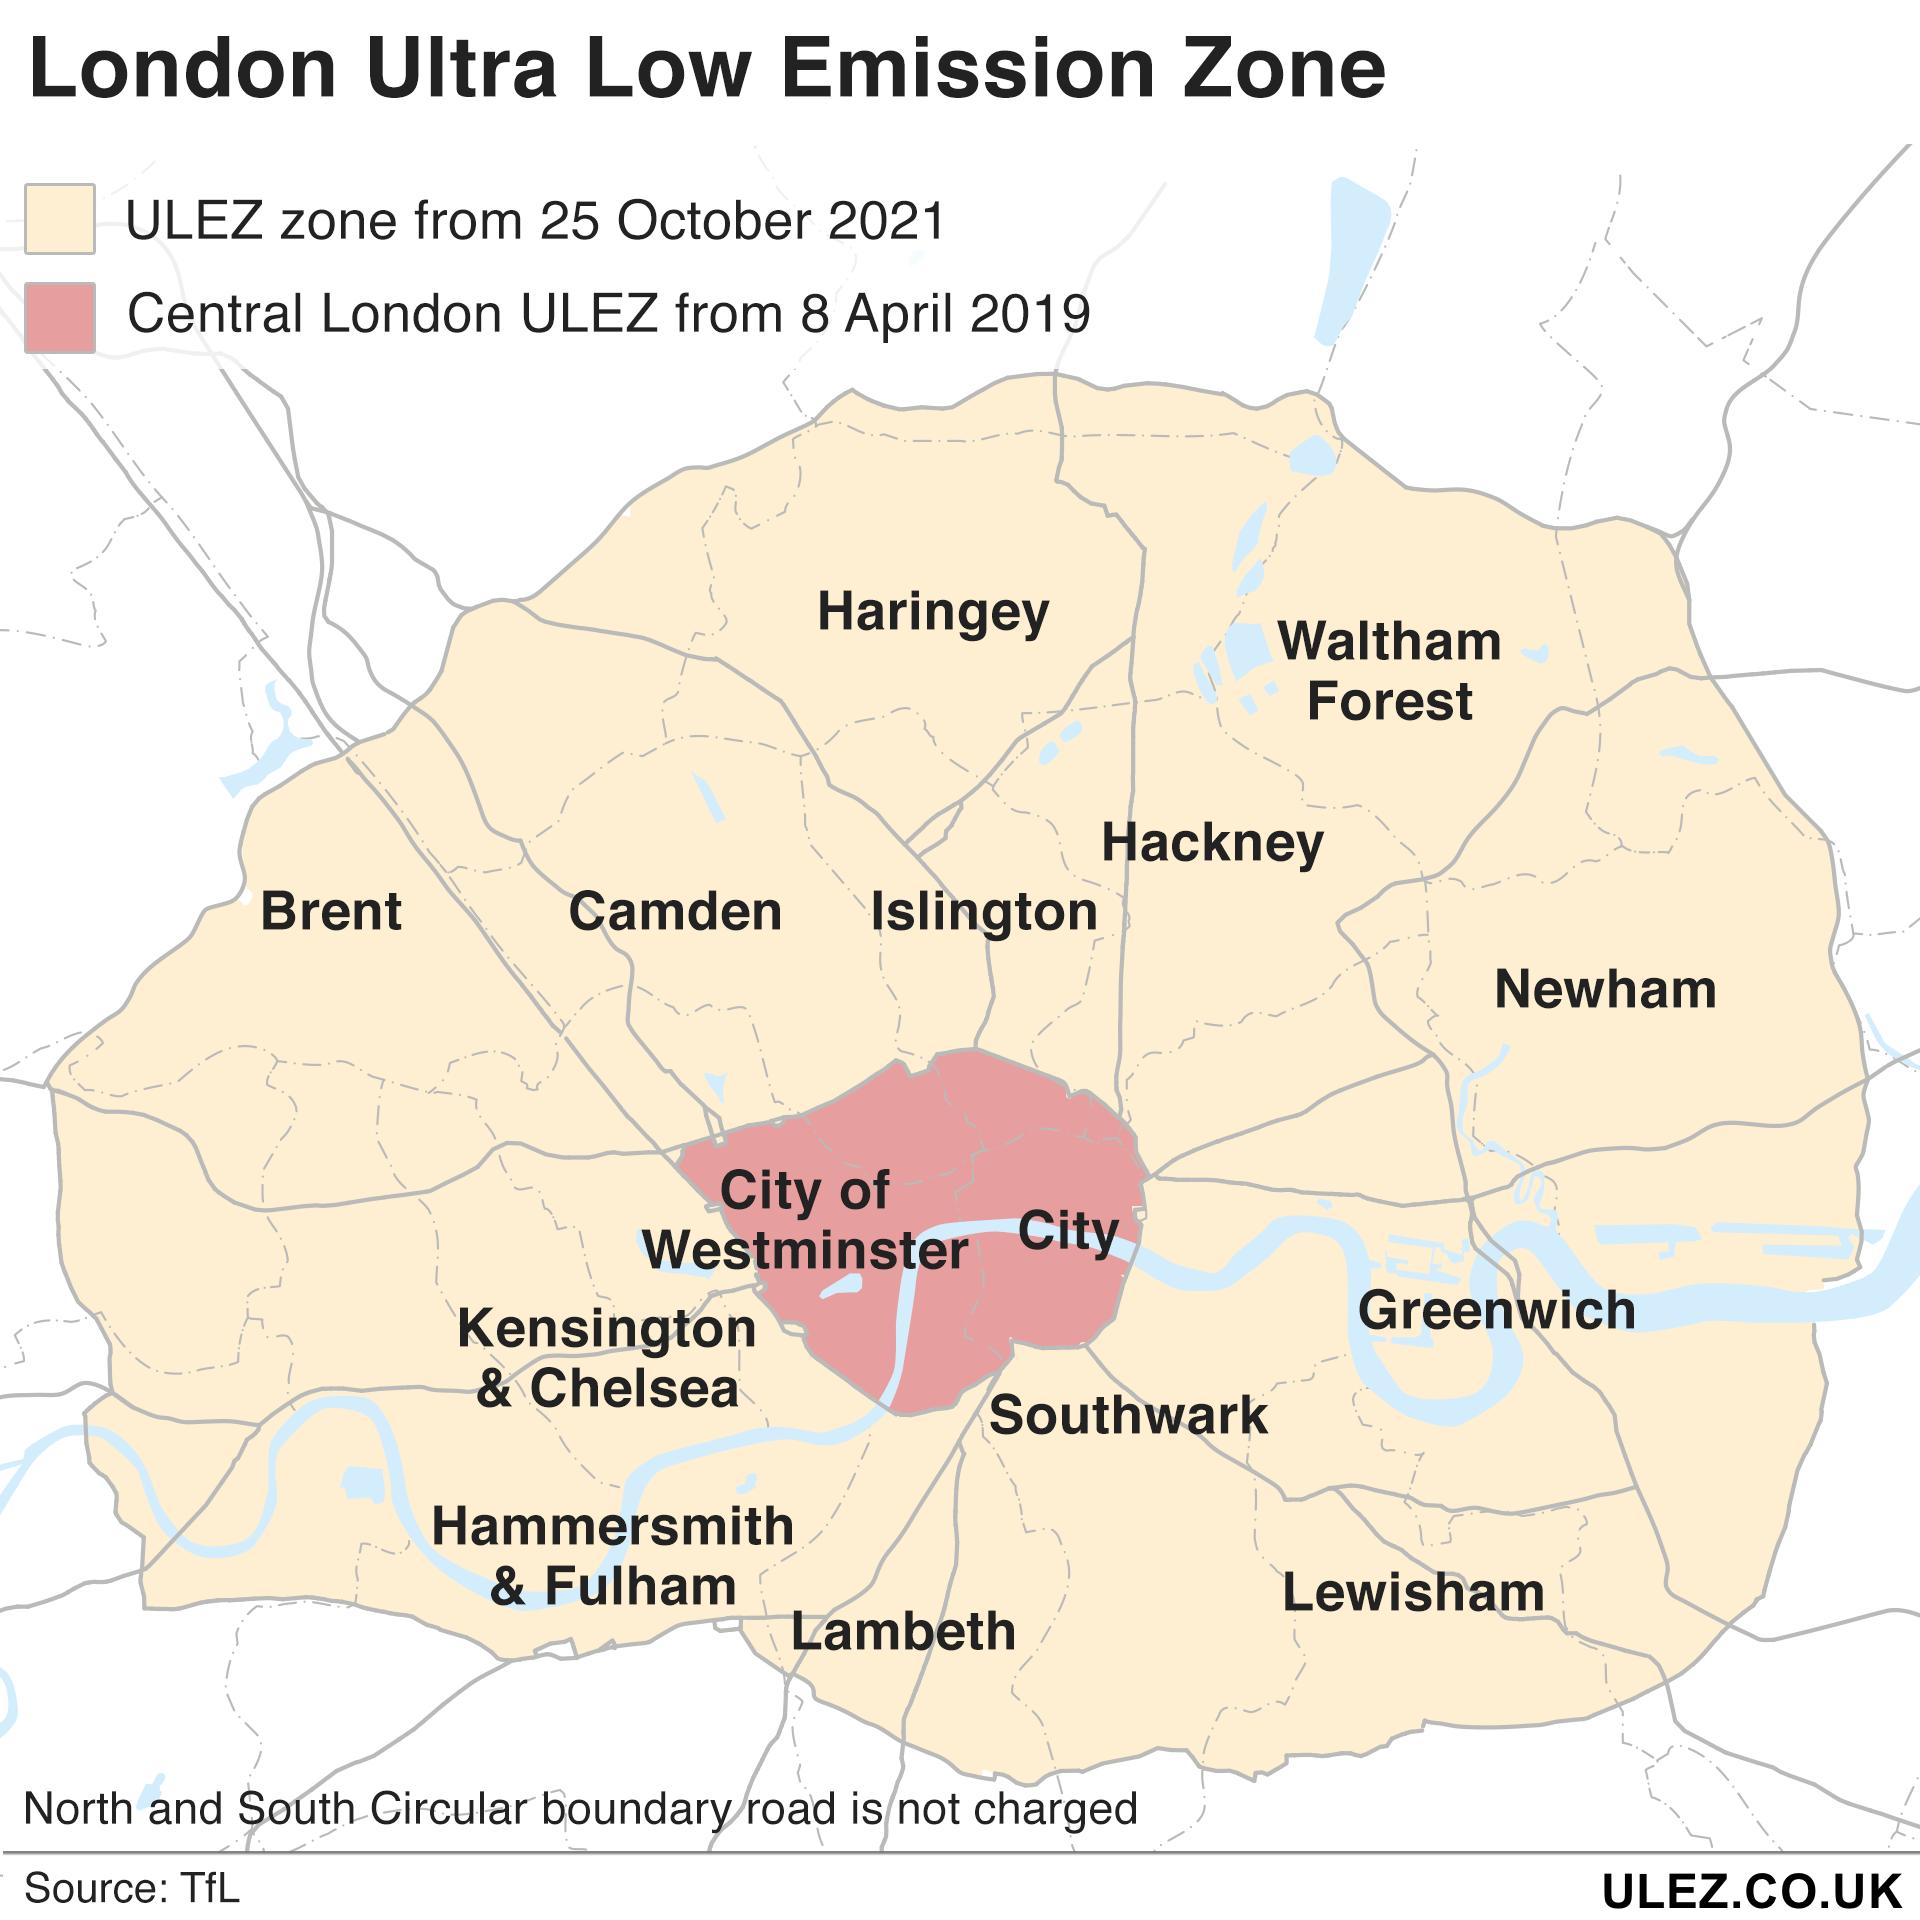 London ULEZ October 25th 2021